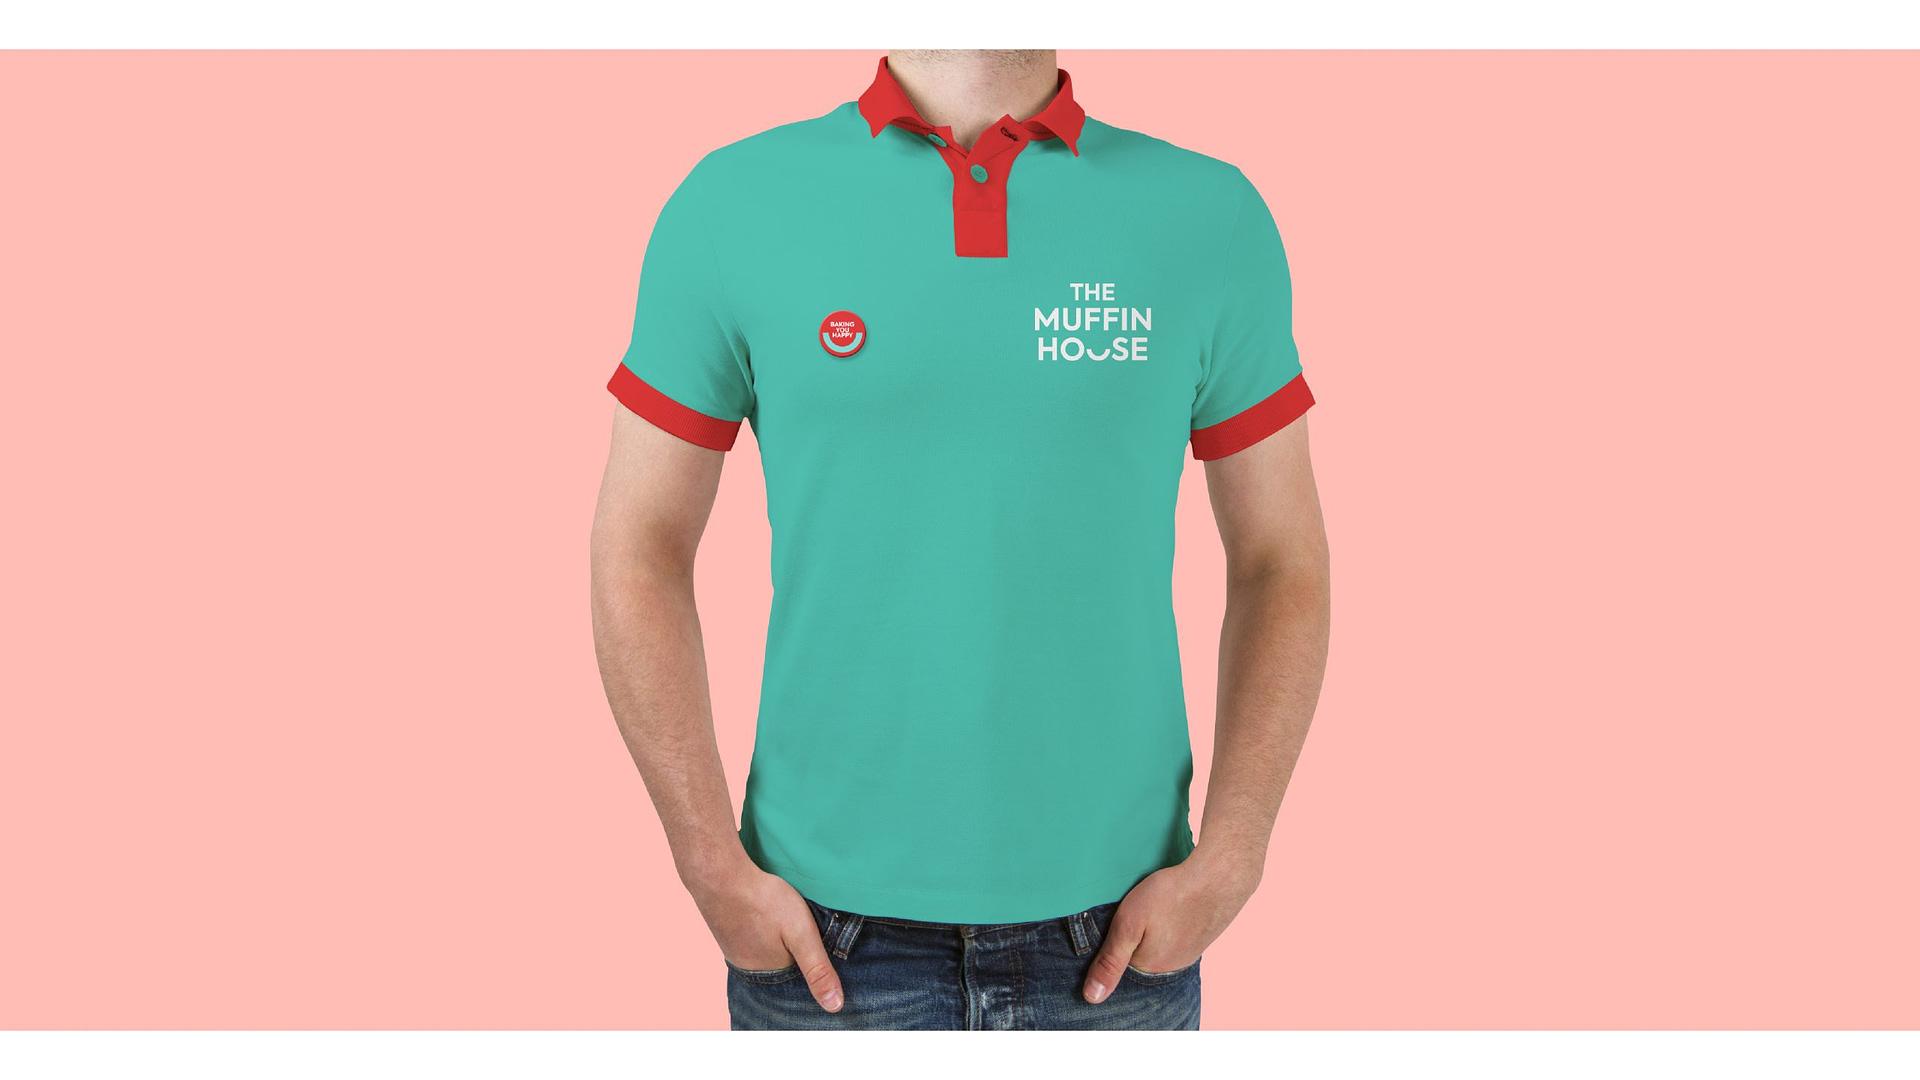 THE MUFFIN HOUSE T SHIRT BRANDING